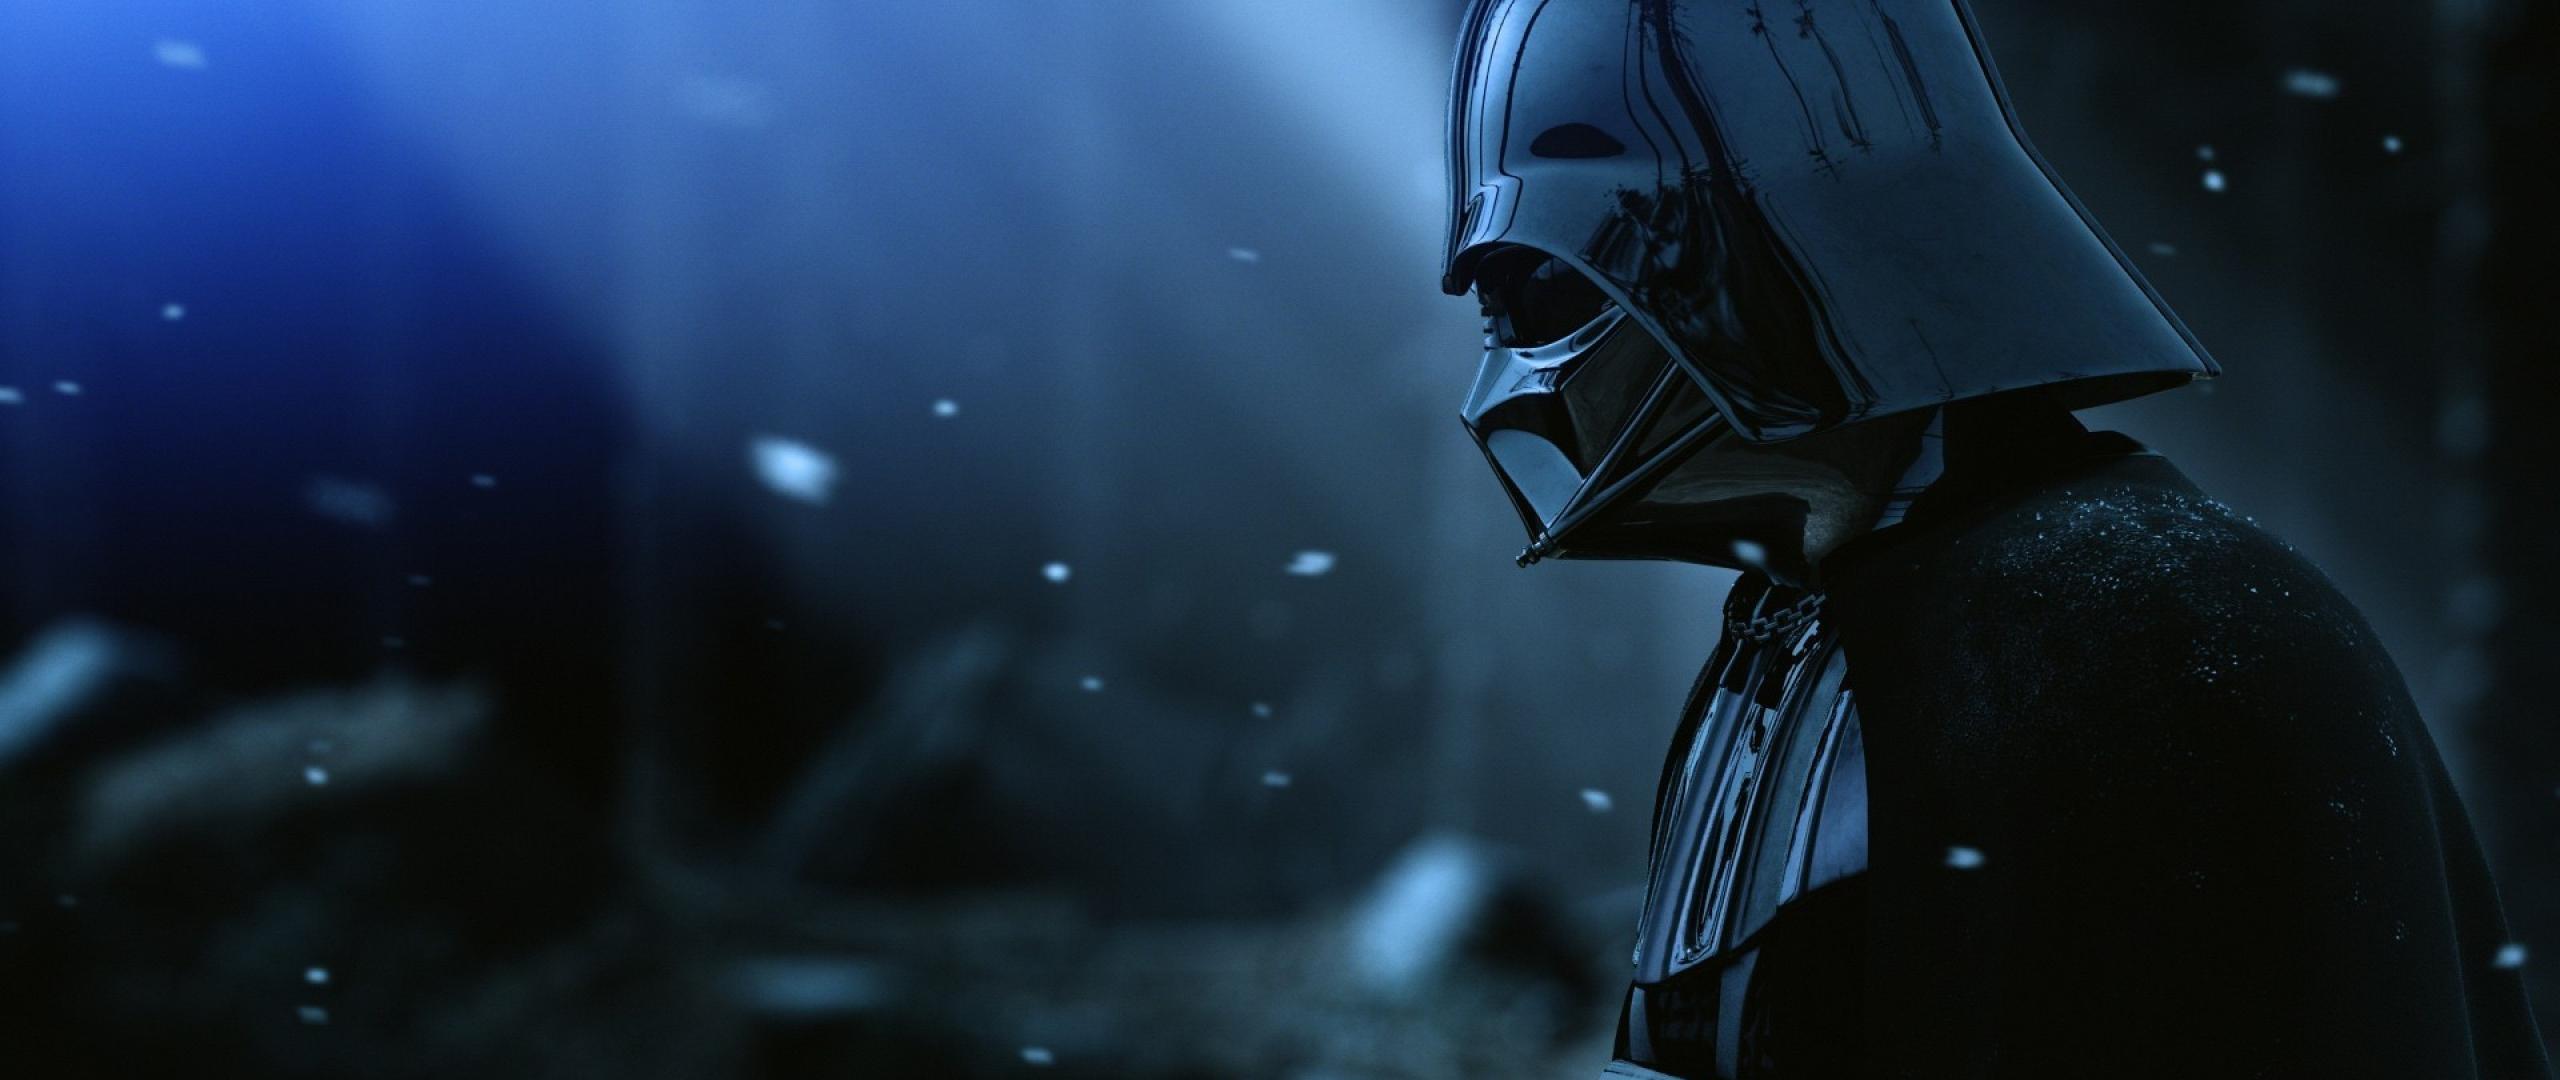 2560x1080 Wallpaper darth vader armor star wars film hat snow 2560x1080